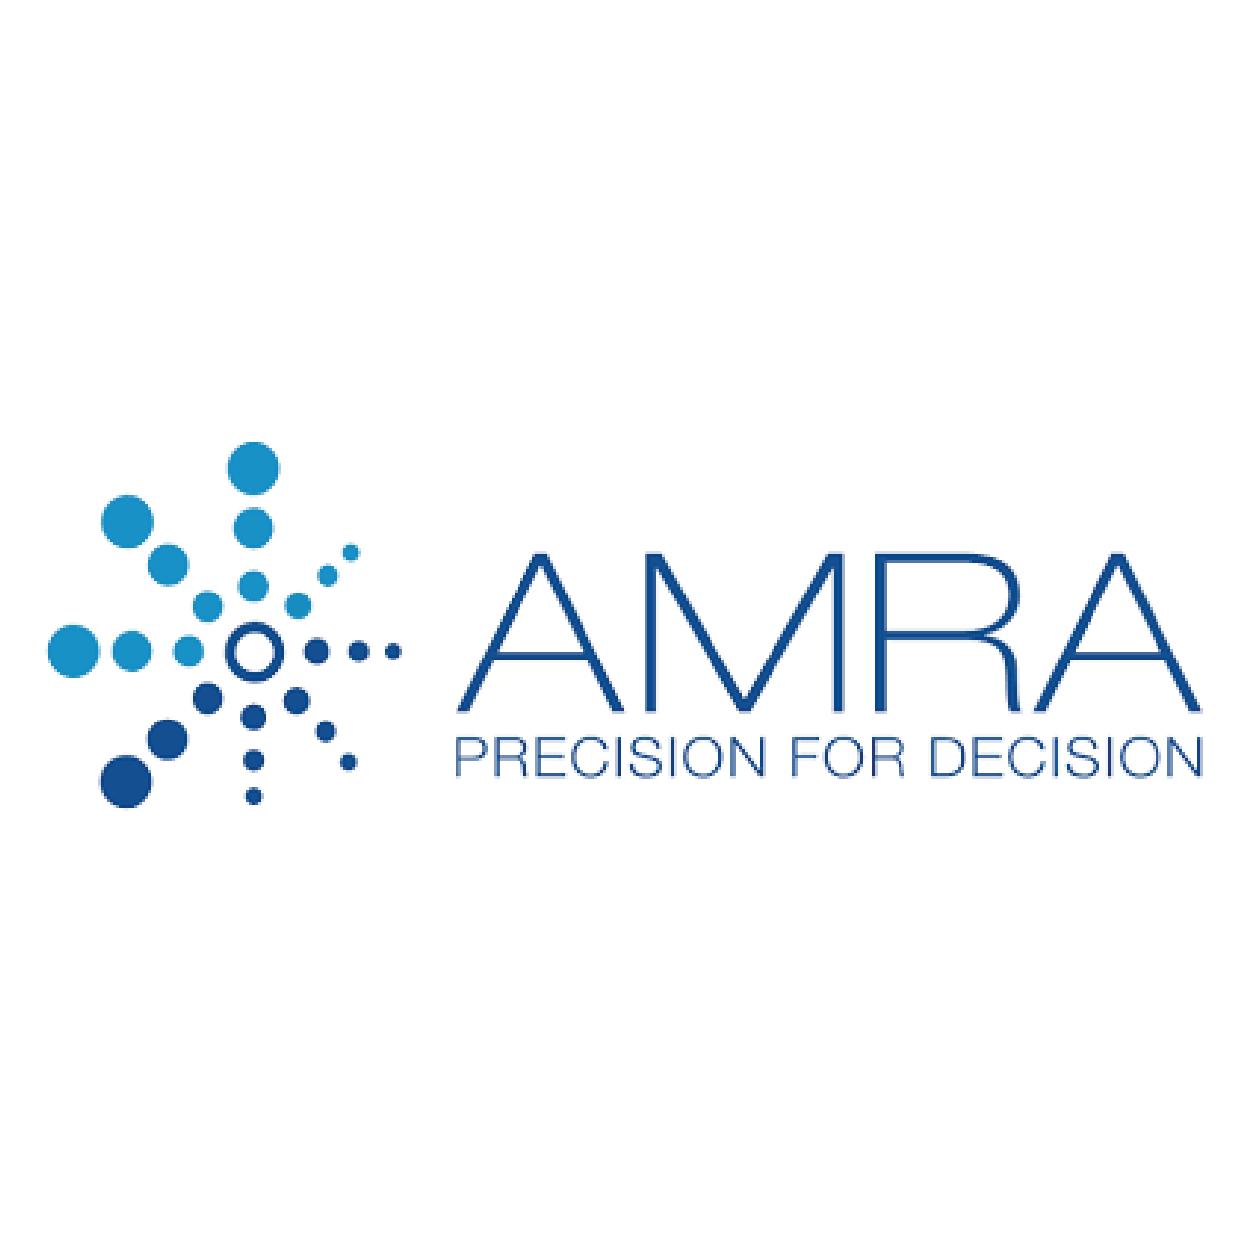 AMRA-01